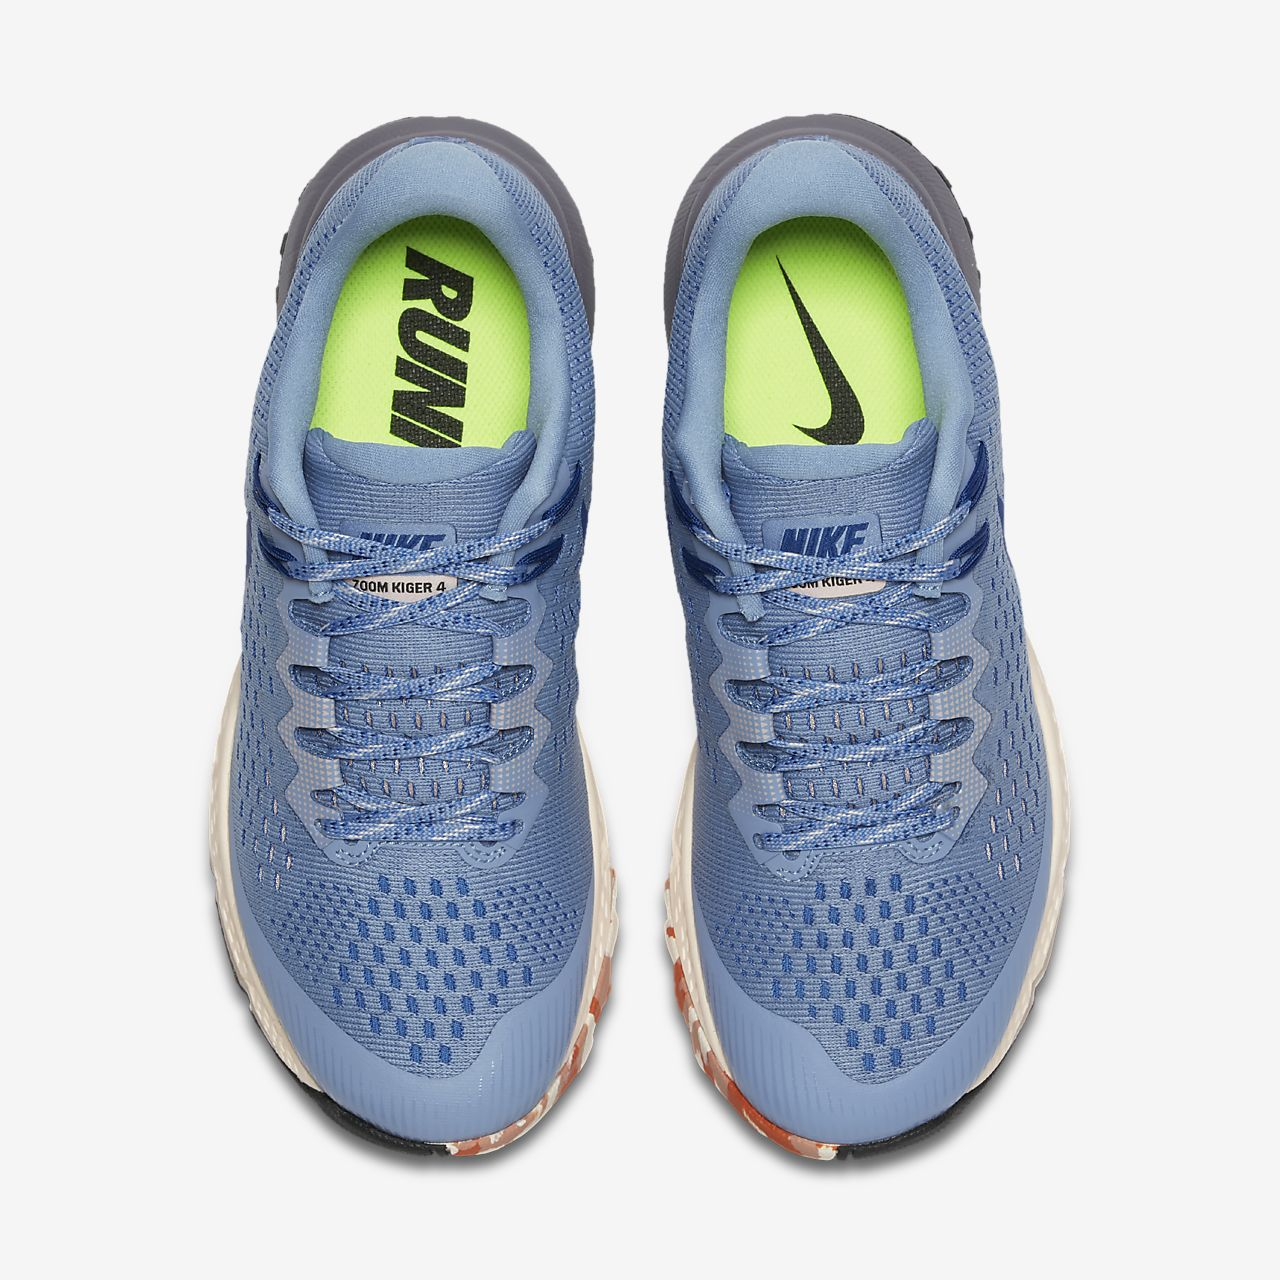 39582722496 Sports   Outdoors Nike Air Zoom Terra Kiger 4 Mens Running Shoe